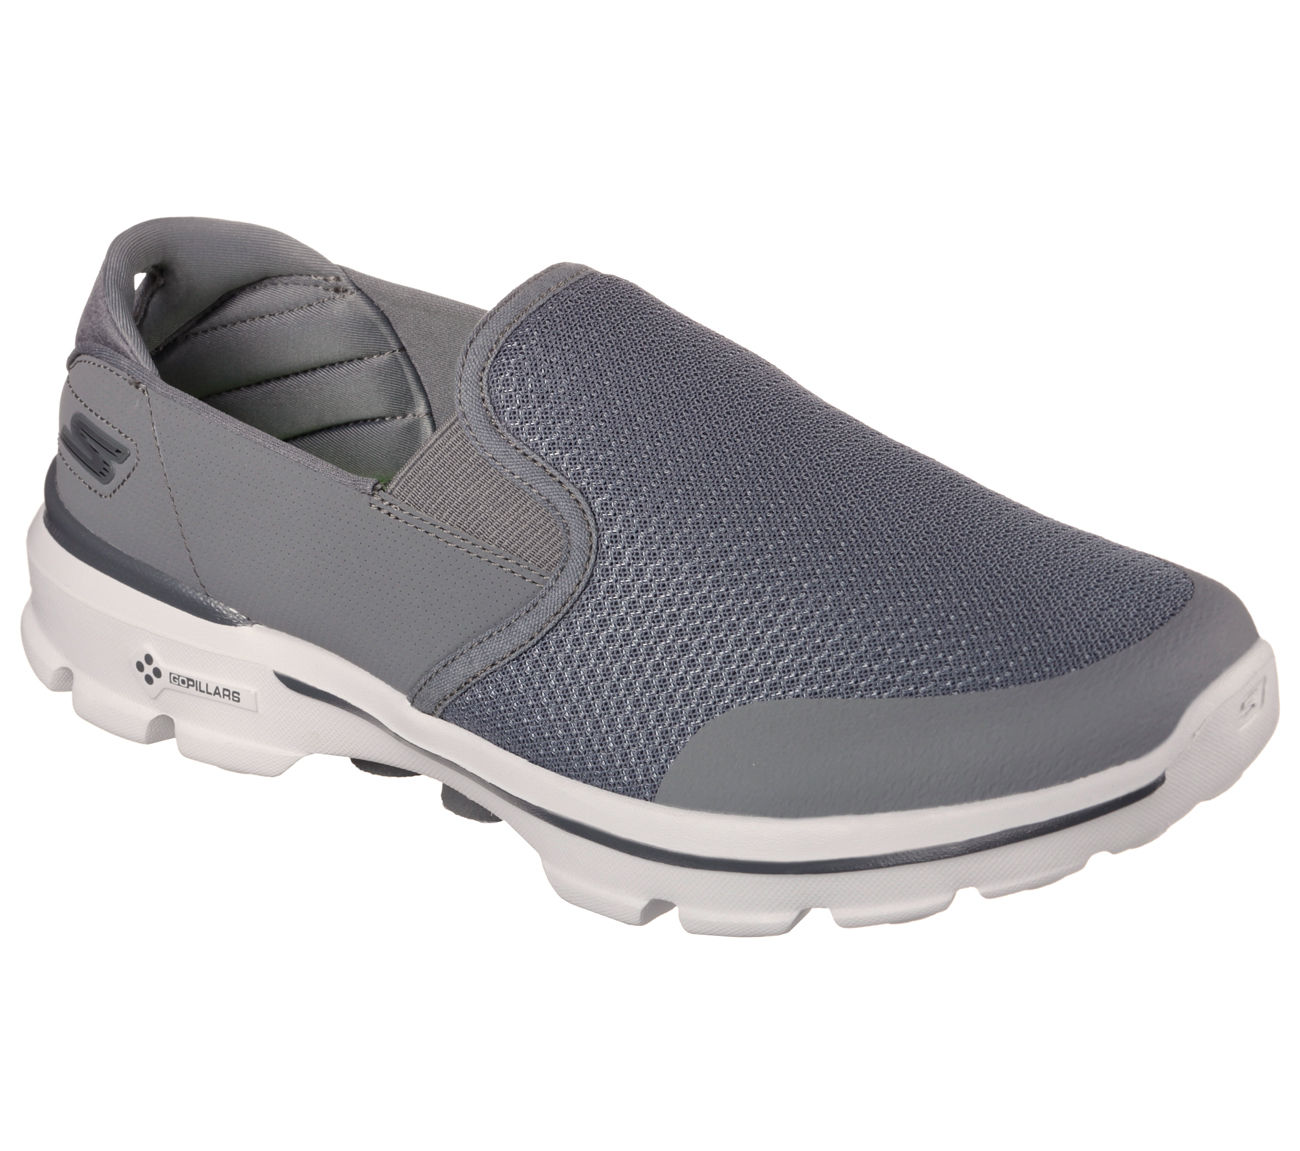 3867ef6e2eb7 skechers go walk mens walking shoes sale   OFF64% Discounted